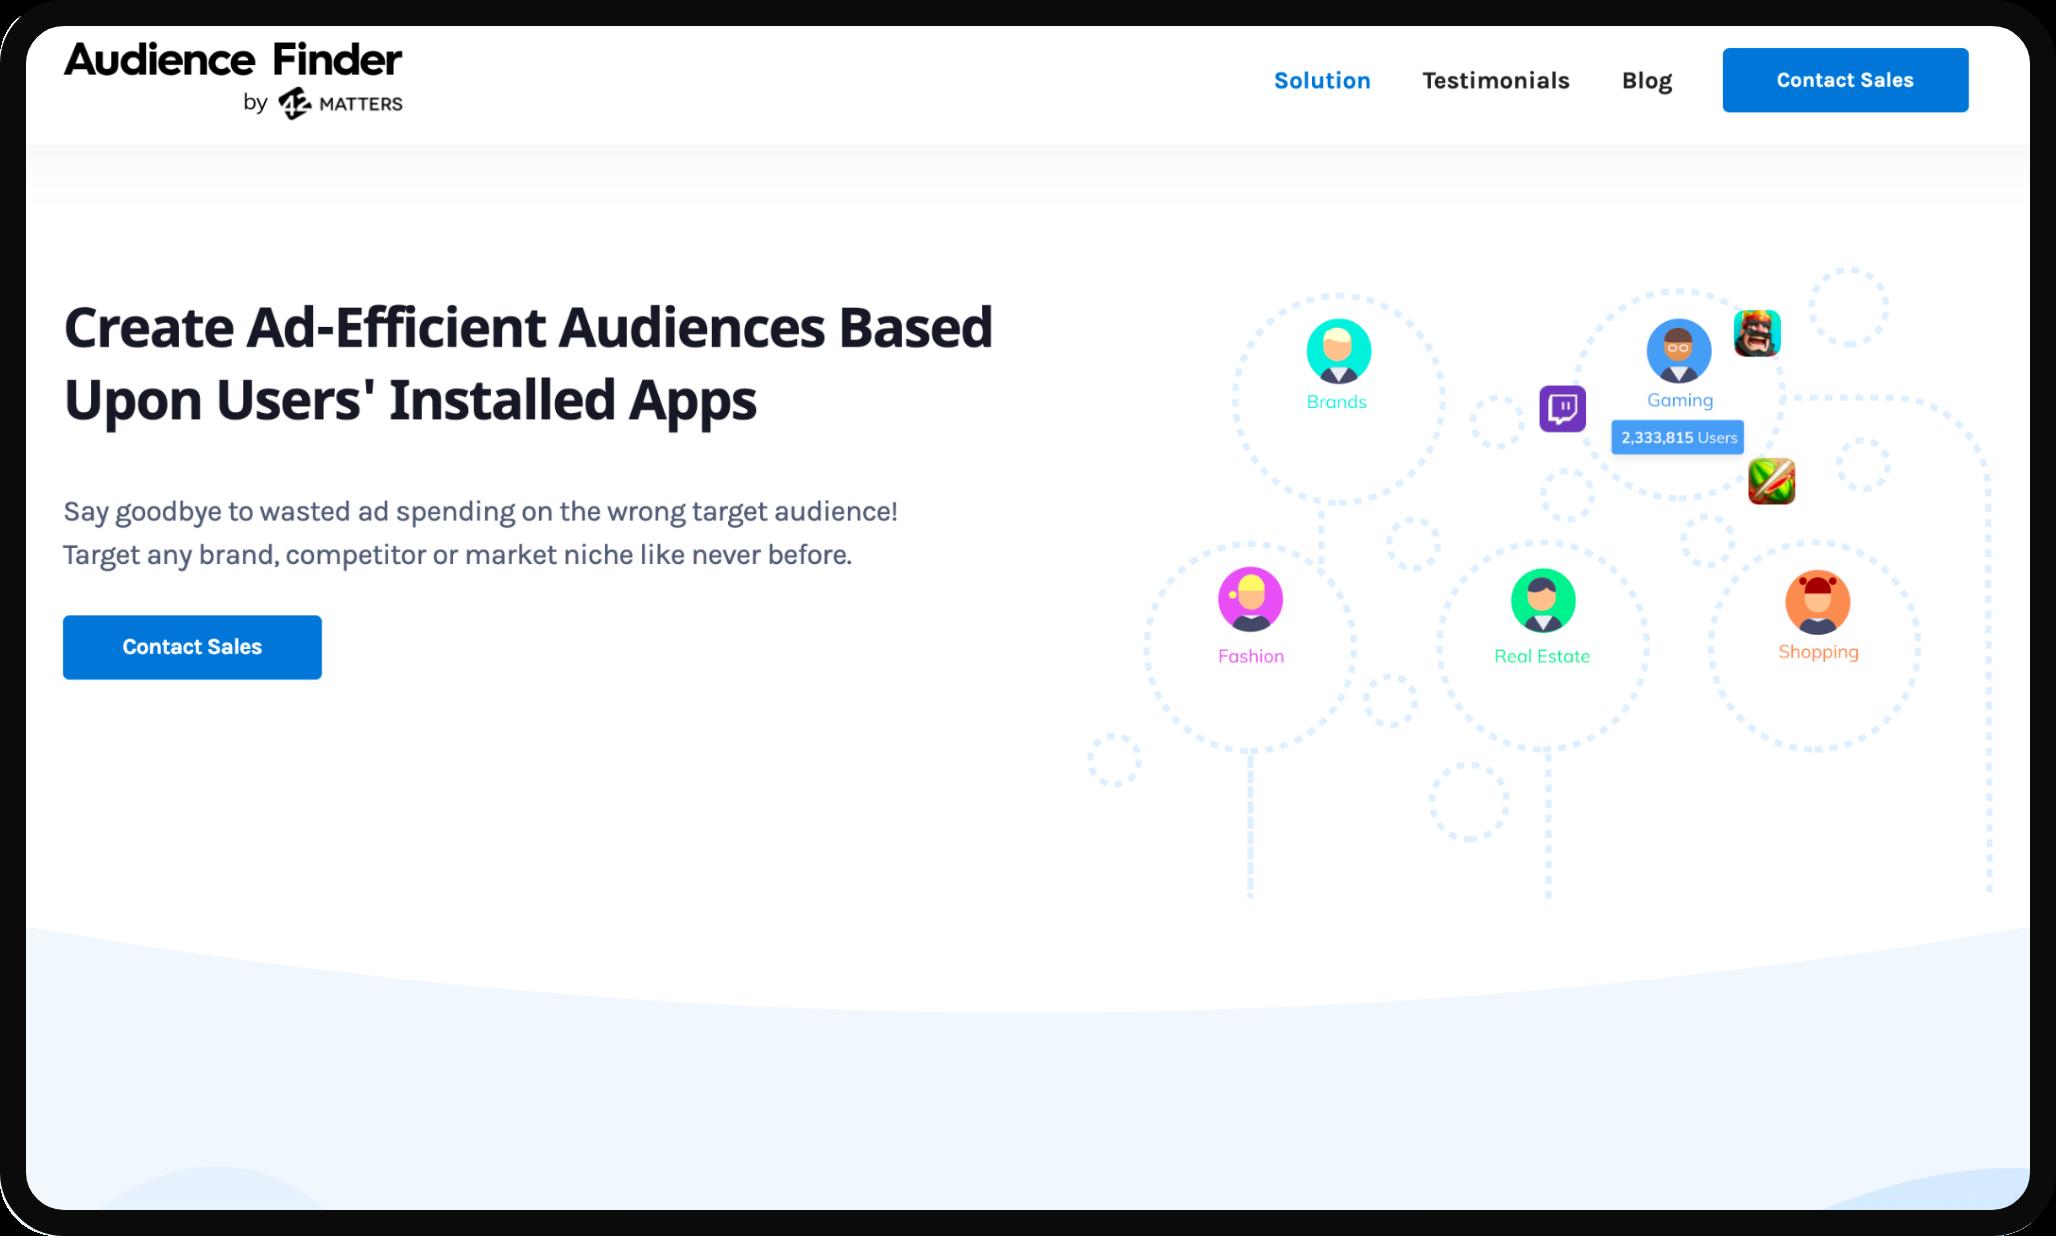 Audience Finder Image